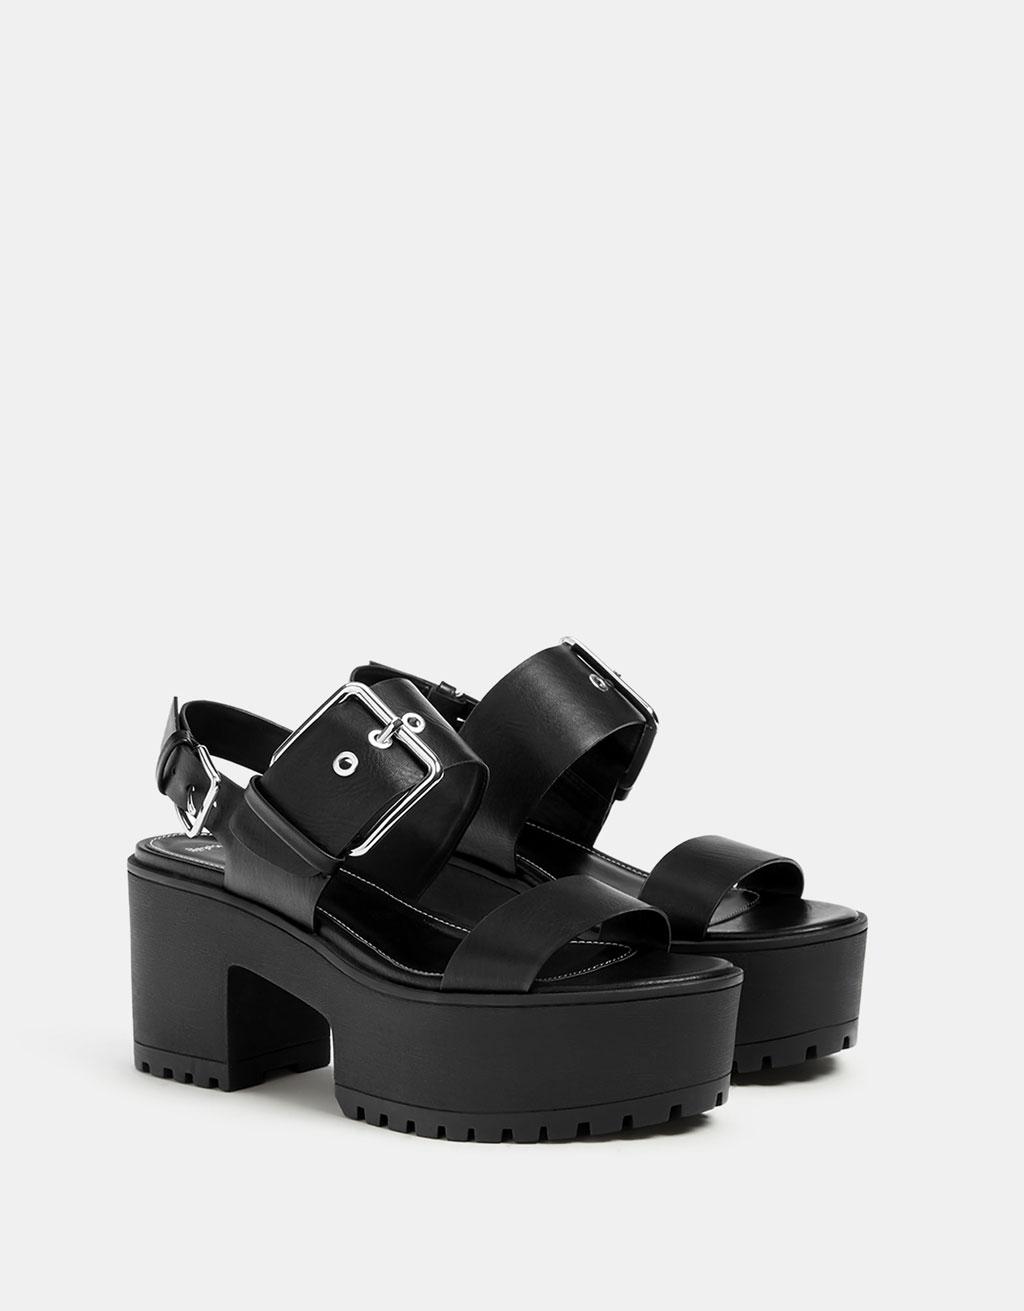 Platform sandals with buckle